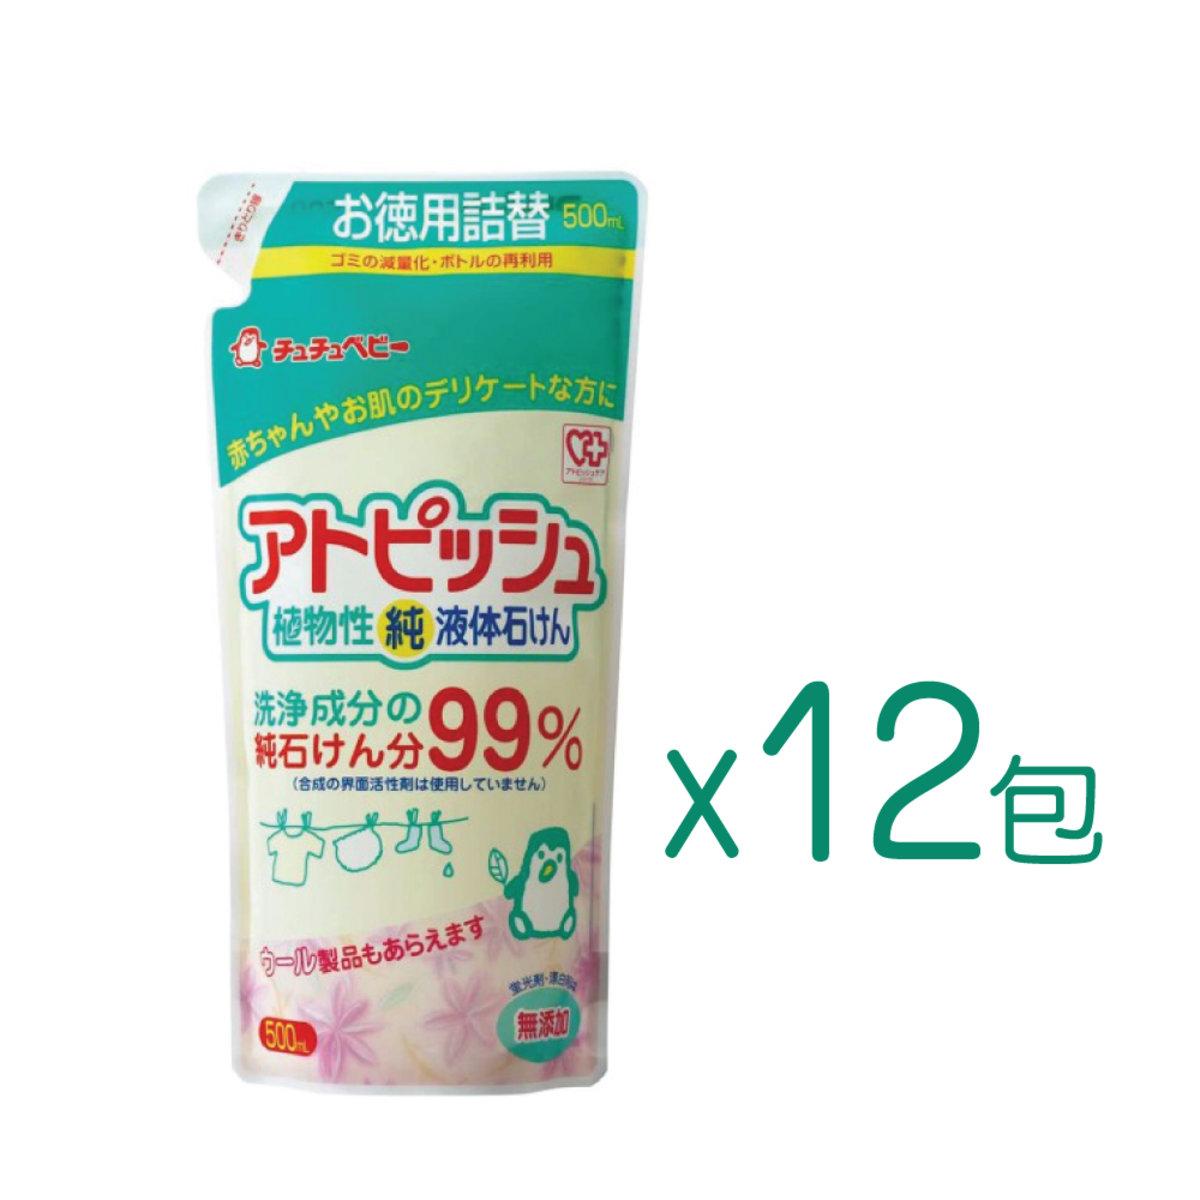 Chu Chu Baby Plant Baby Laundry Liquid (Refill) 500ml (Original Box 12 Pack) (parallel import)